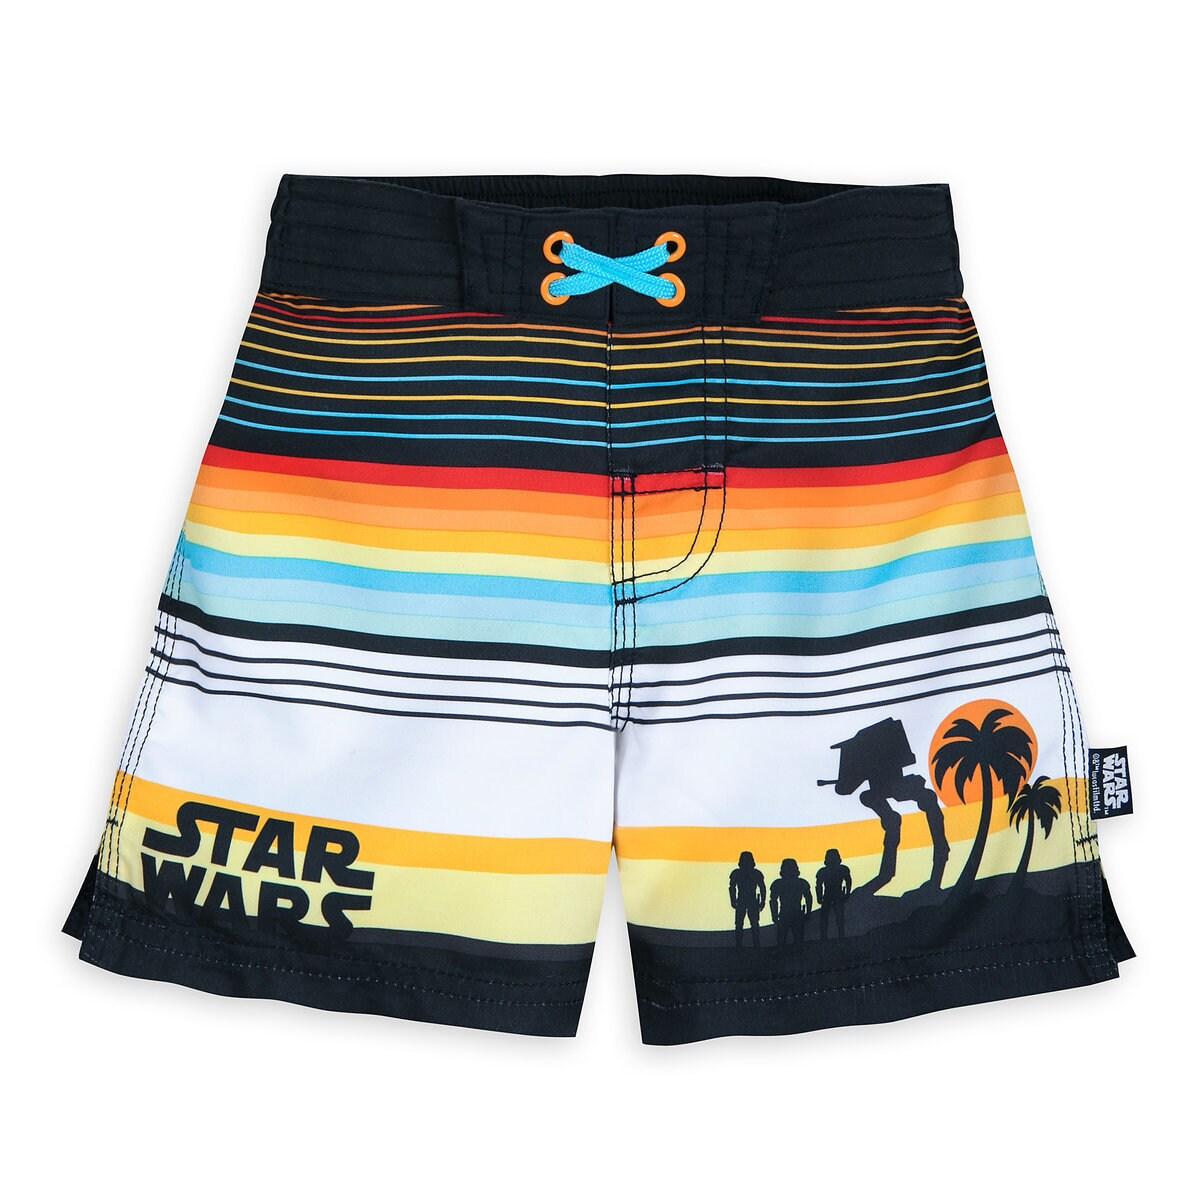 37b4bda9c0 Product Image of Star Wars Swim Trunks for Boys # 1